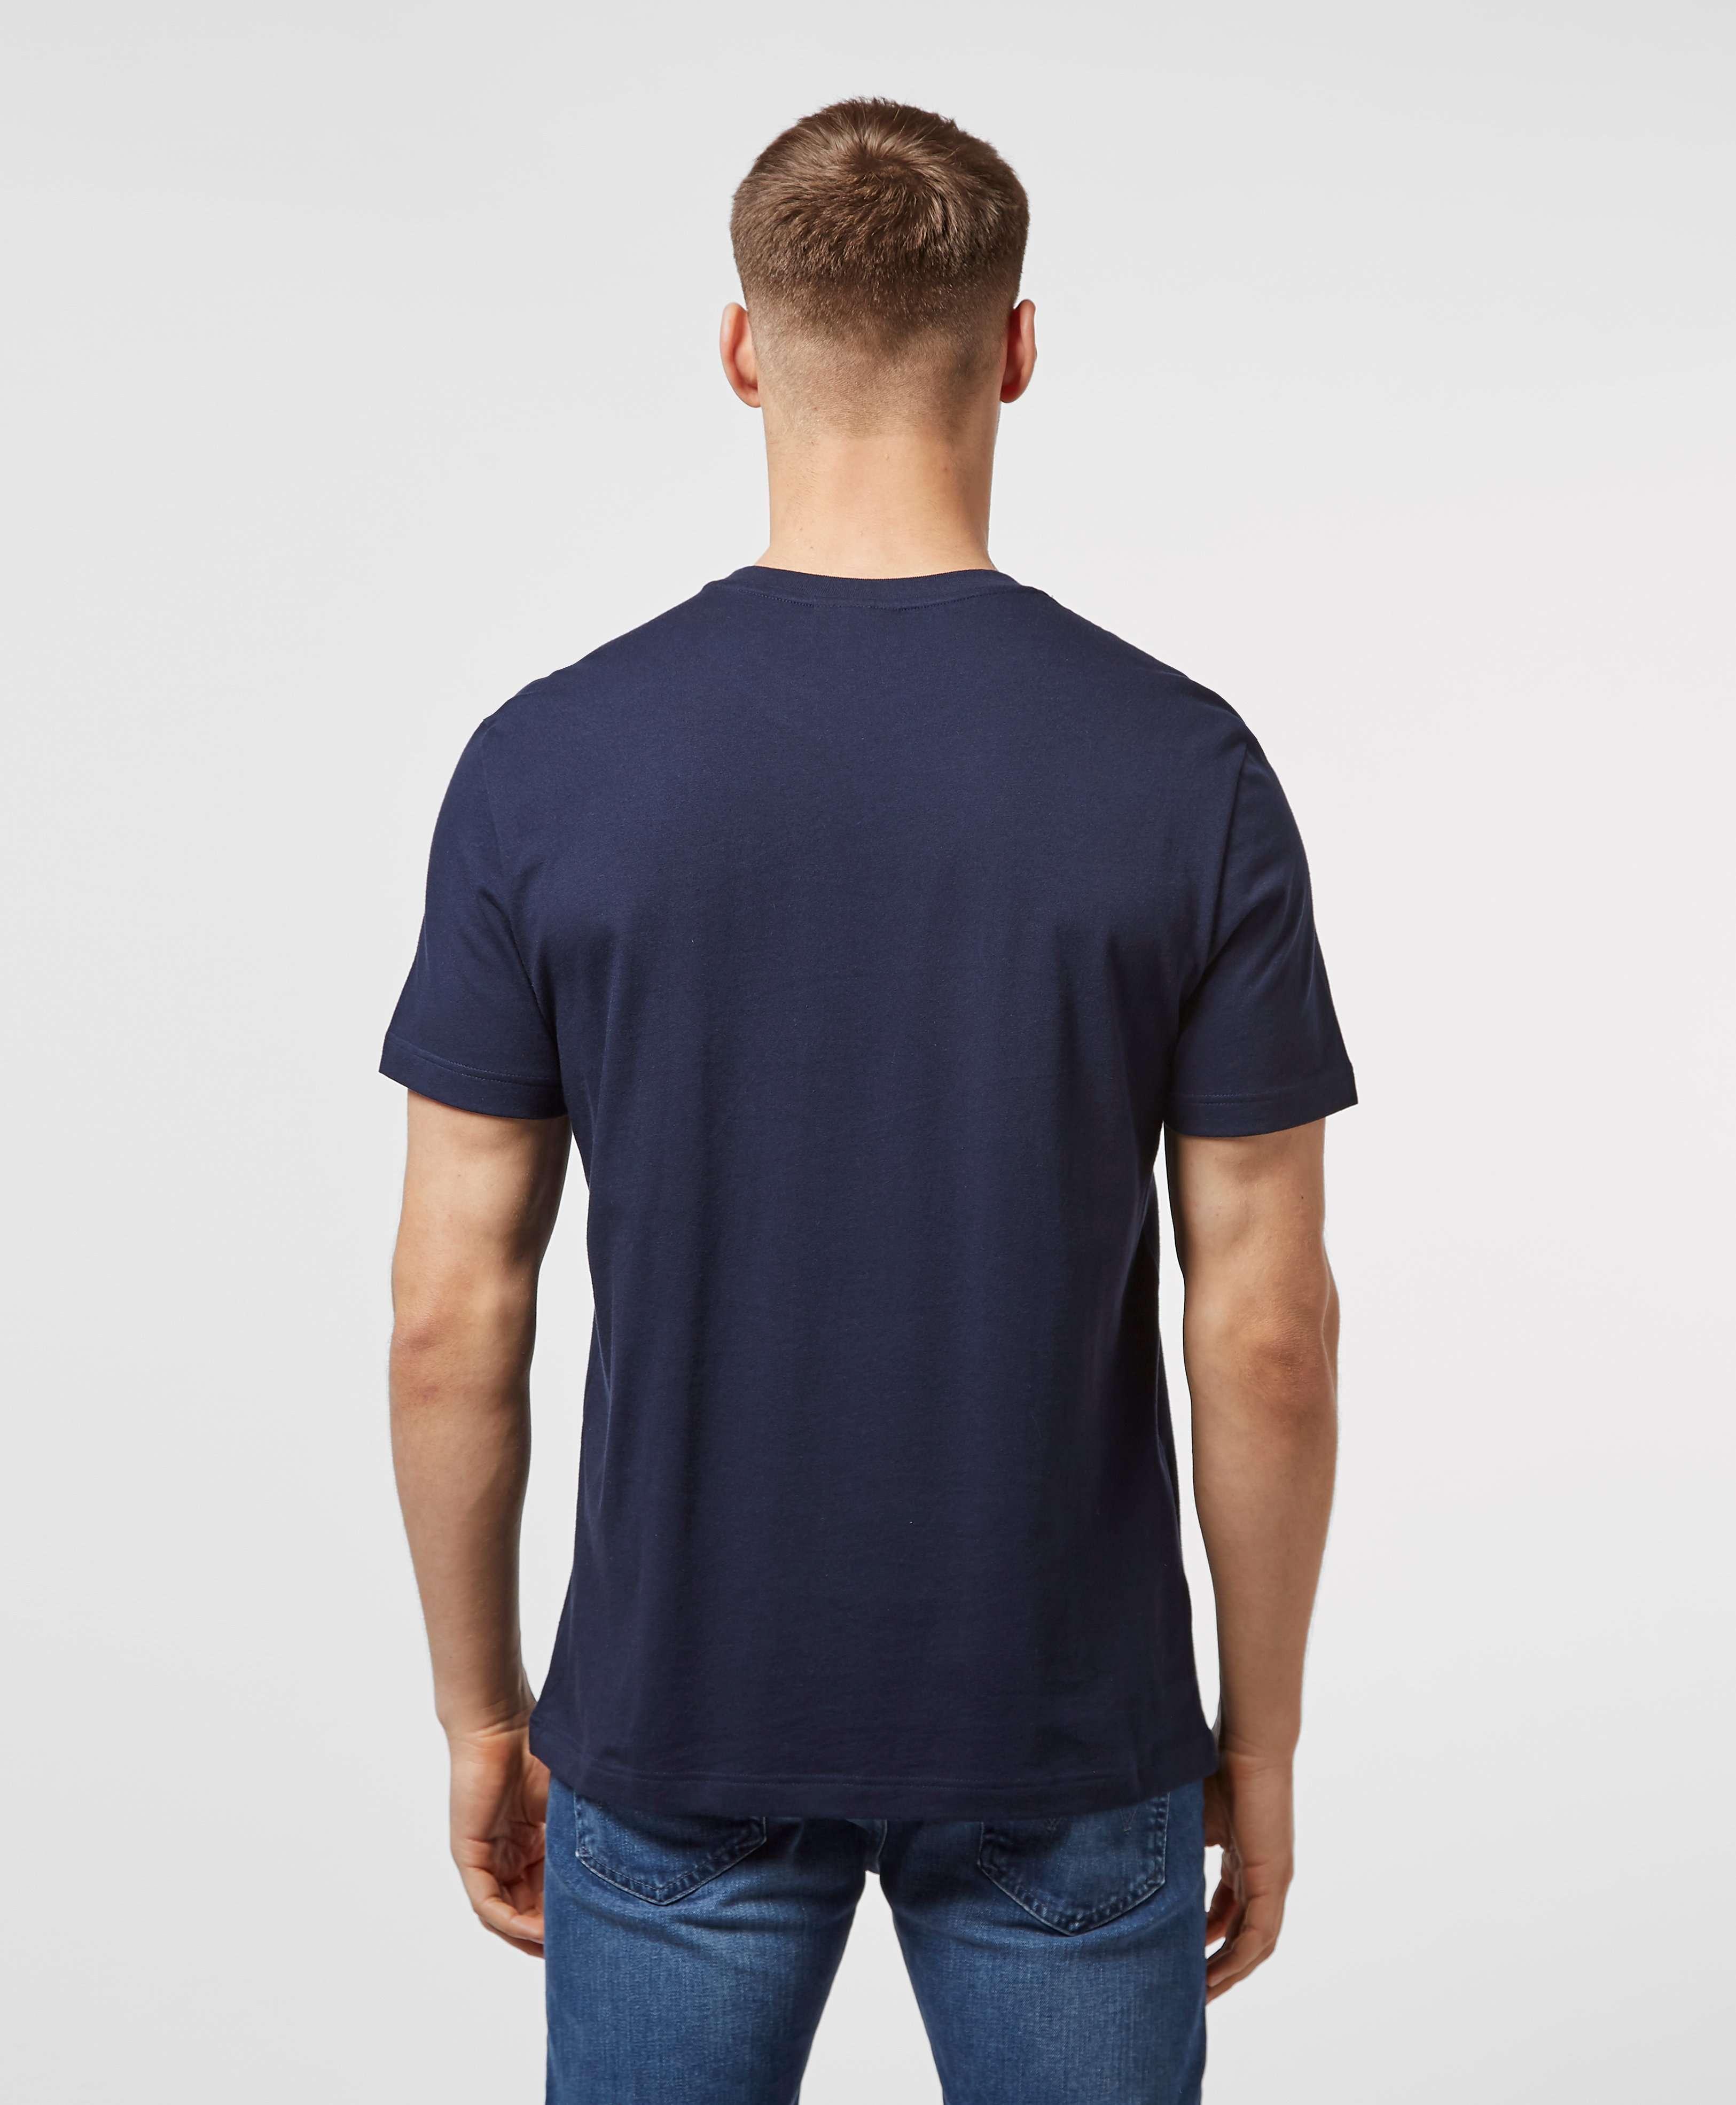 Lacoste Vintage Logo Short Sleeve T-Shirt